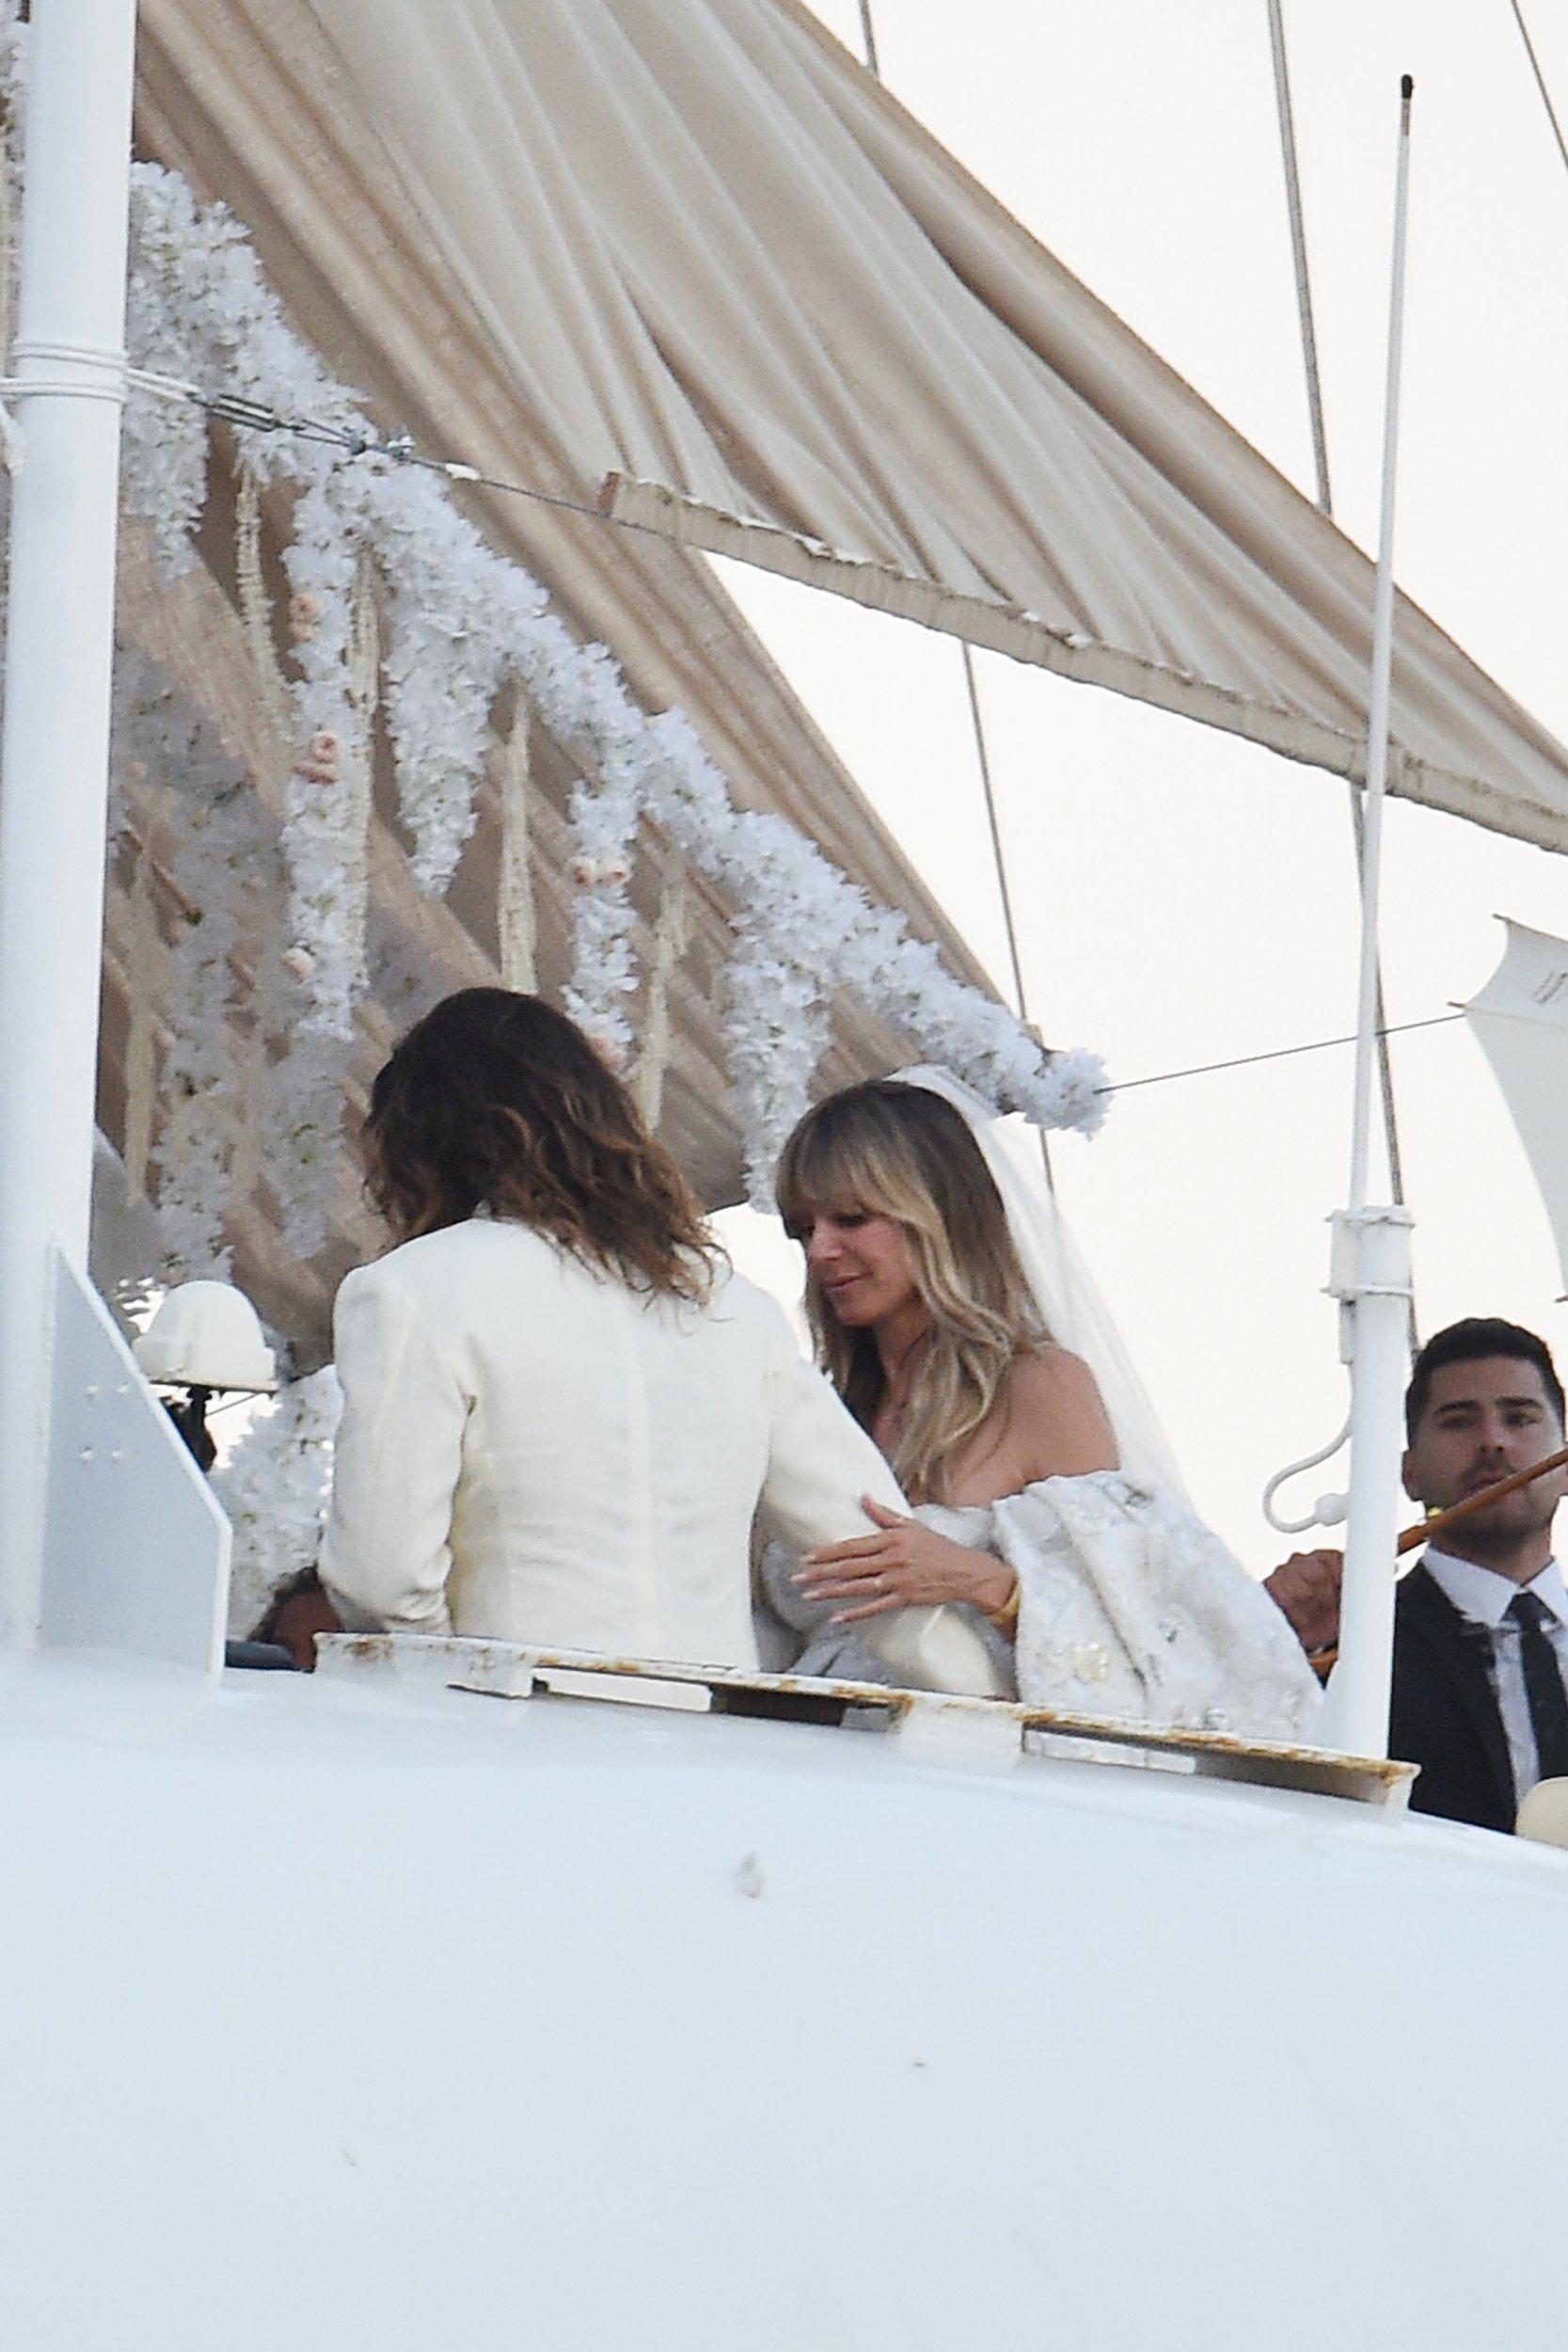 Kaulitz Stunning Time Heidi Italian Marries Second Tom For Klum In NOk8nwPX0